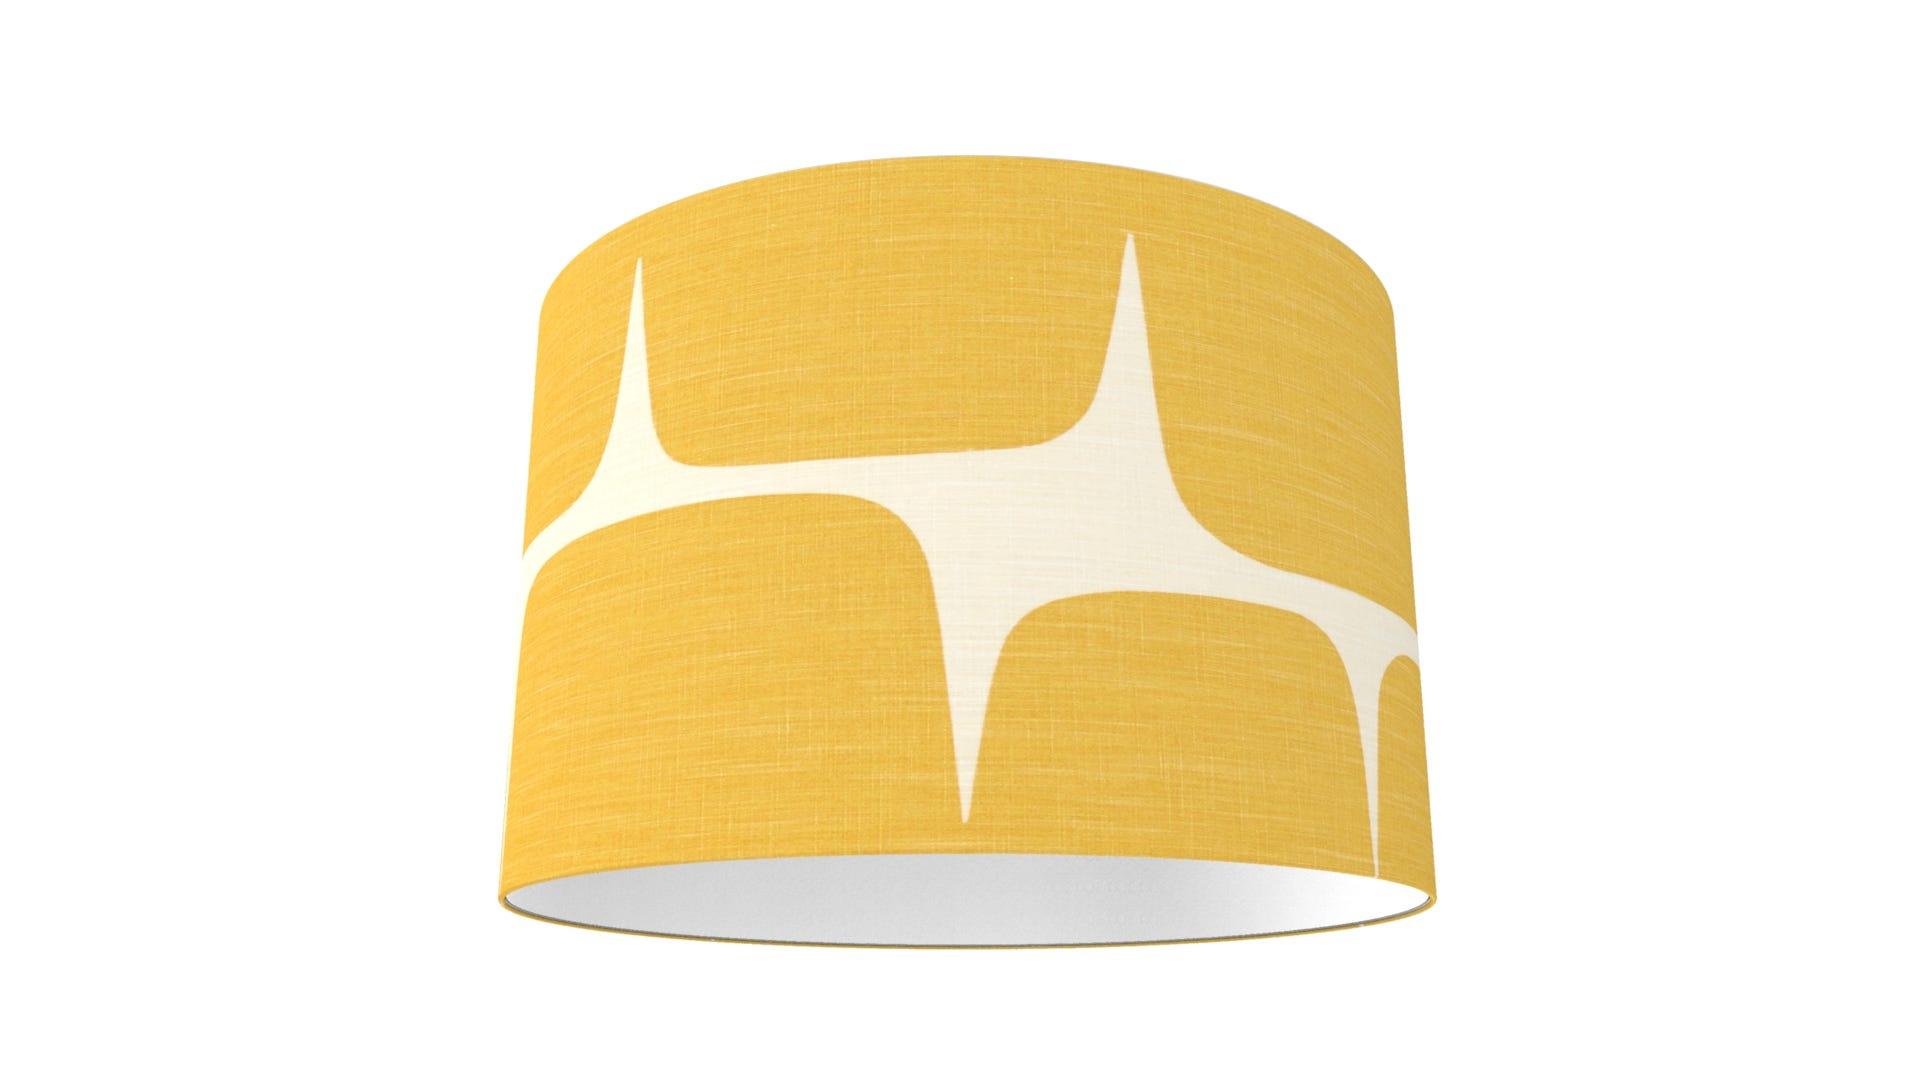 Patterned Shades - Lamp Shades - Lighting